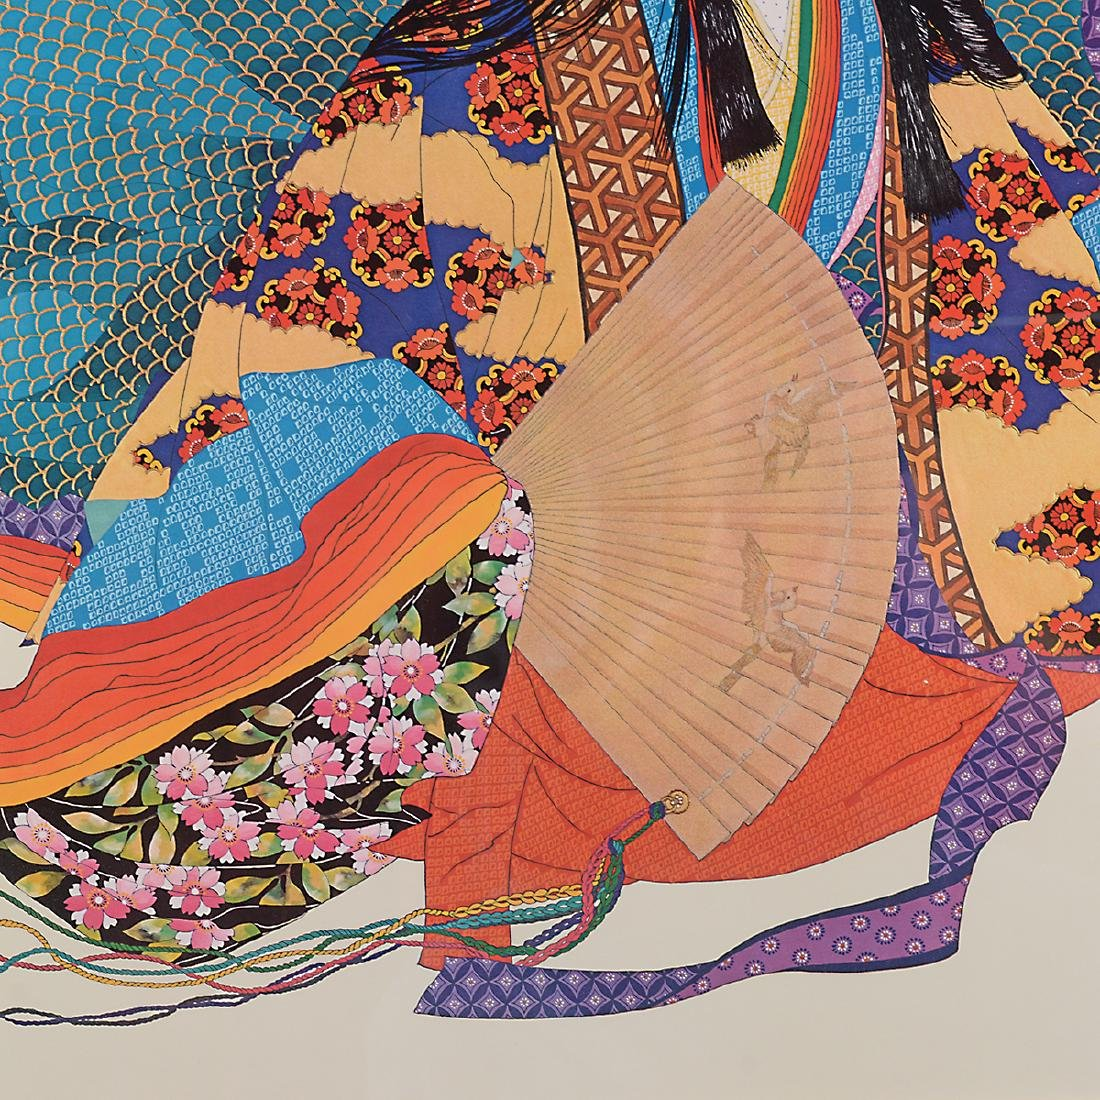 Hisashi Otsuka (b. 1947): The 36th Poetess - 3